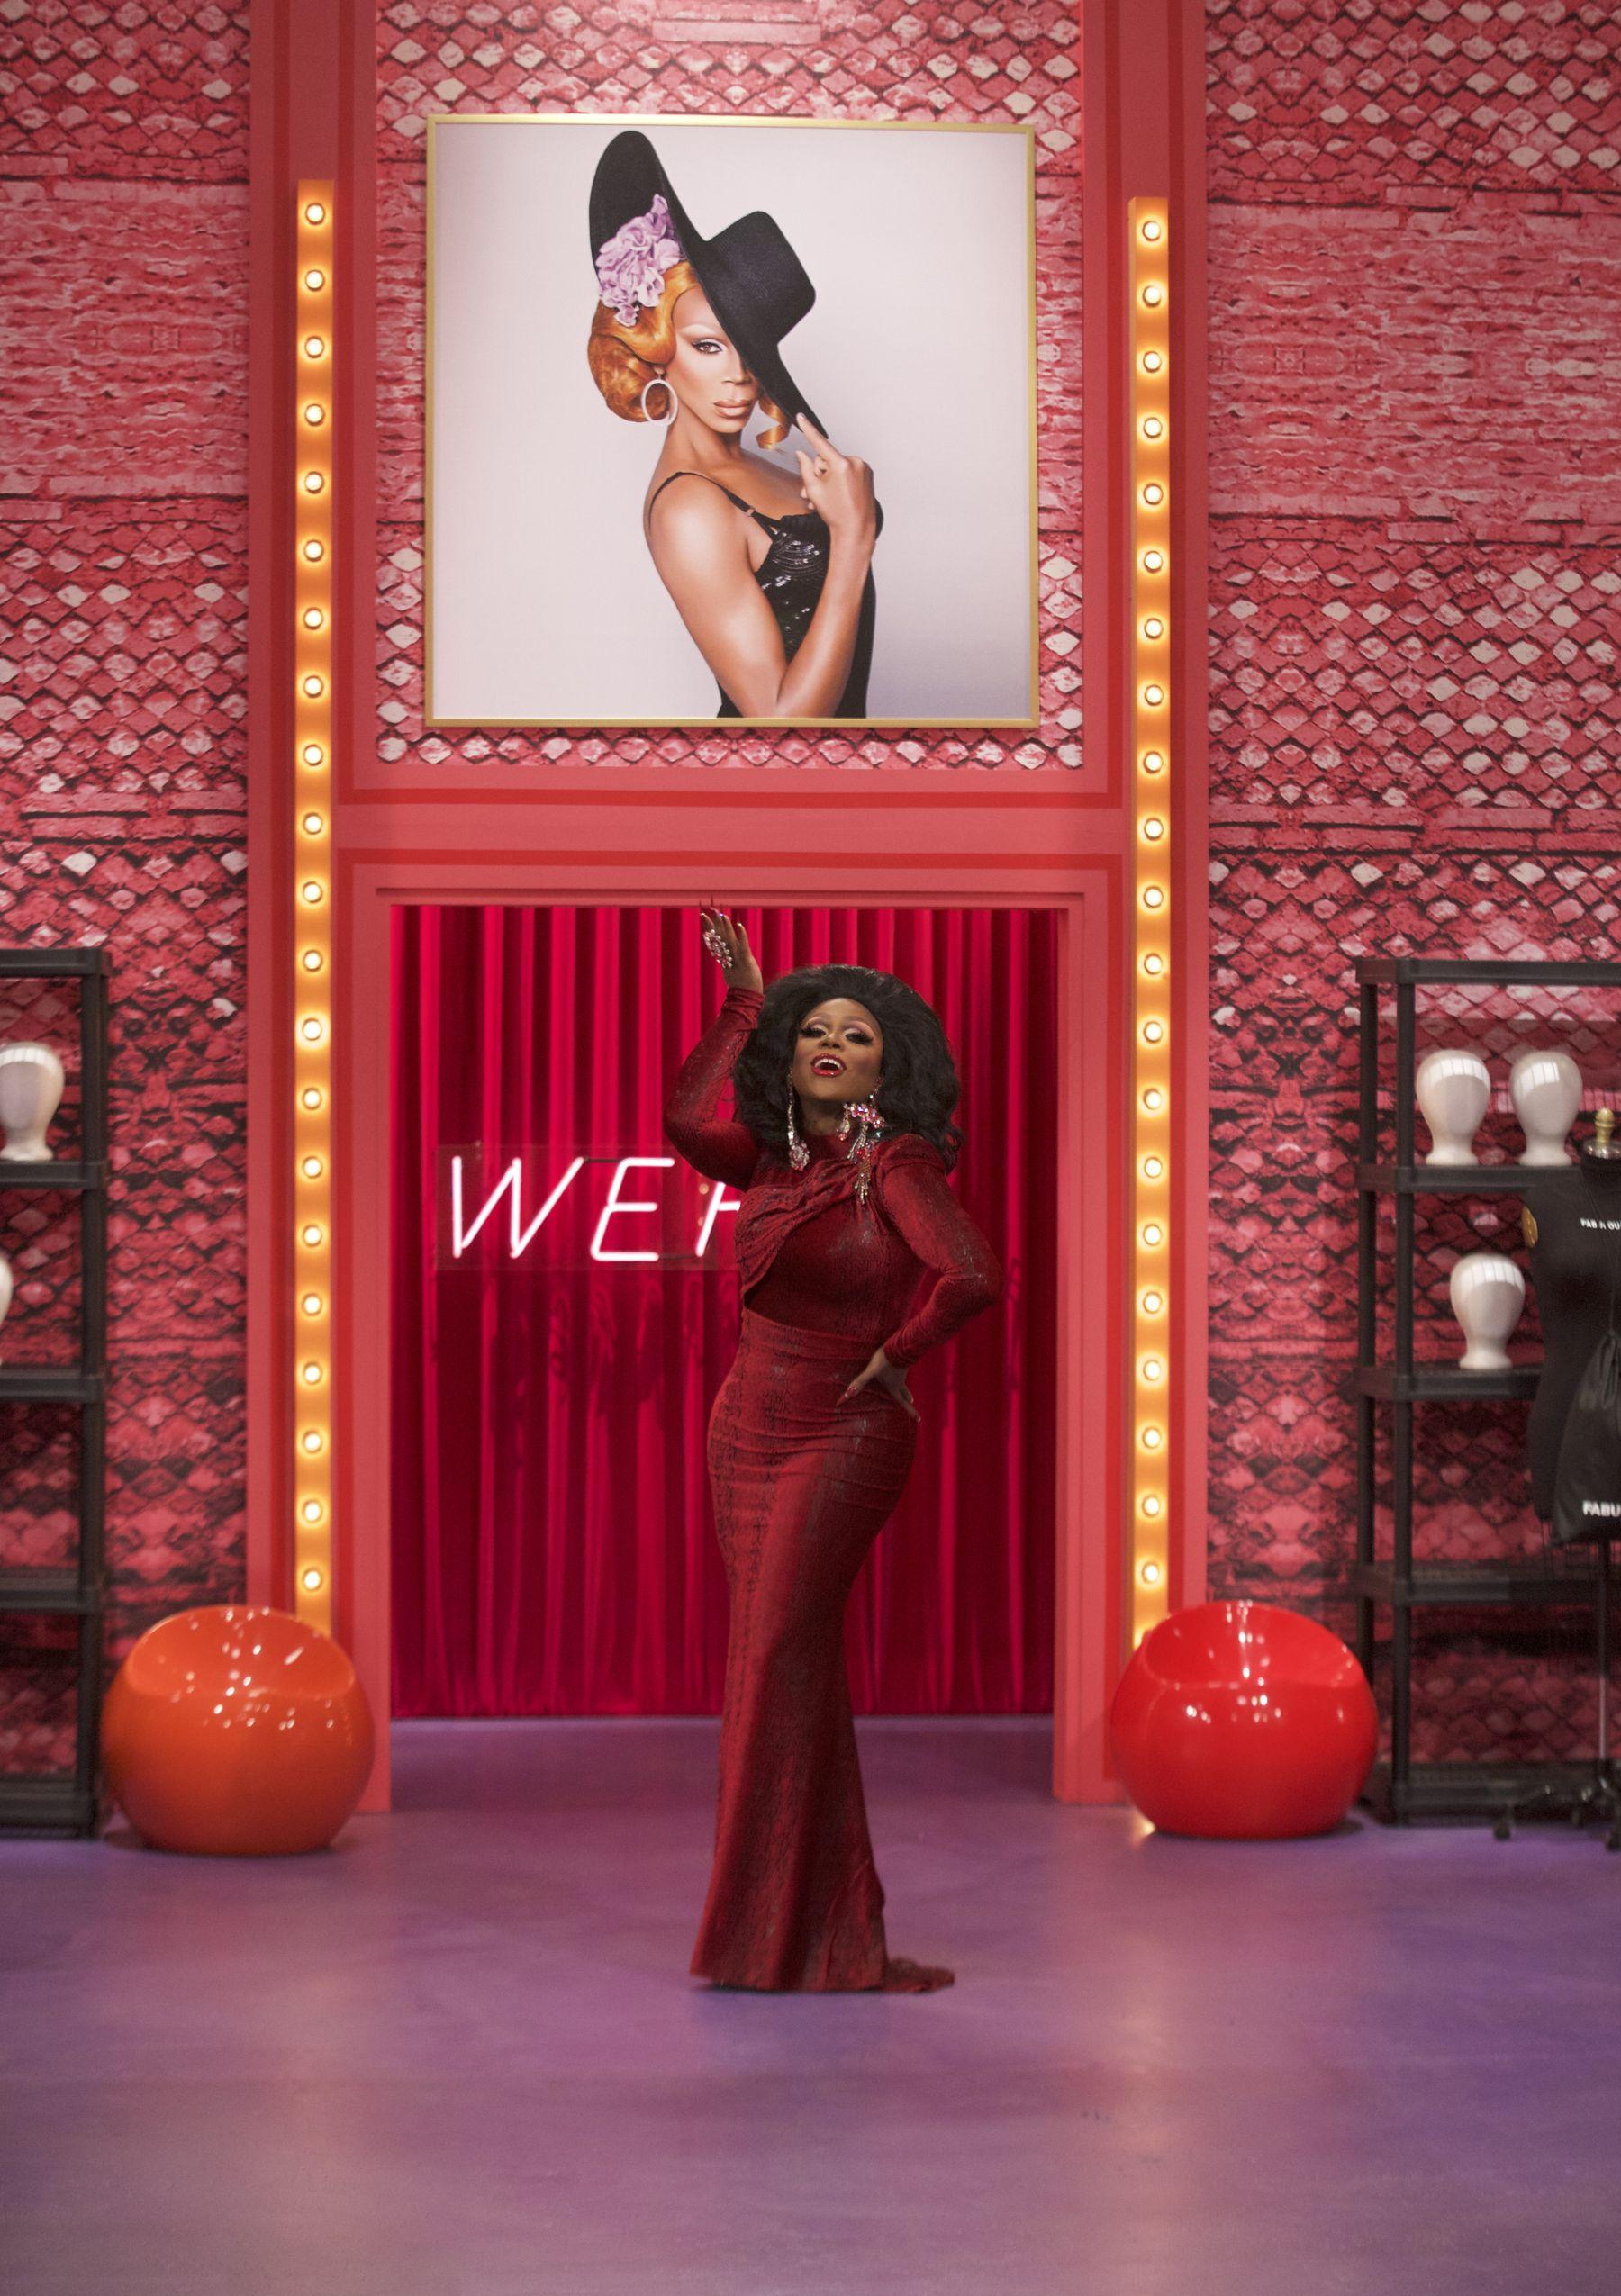 Mayhem Miller RuPaul's Drag Race Season 10